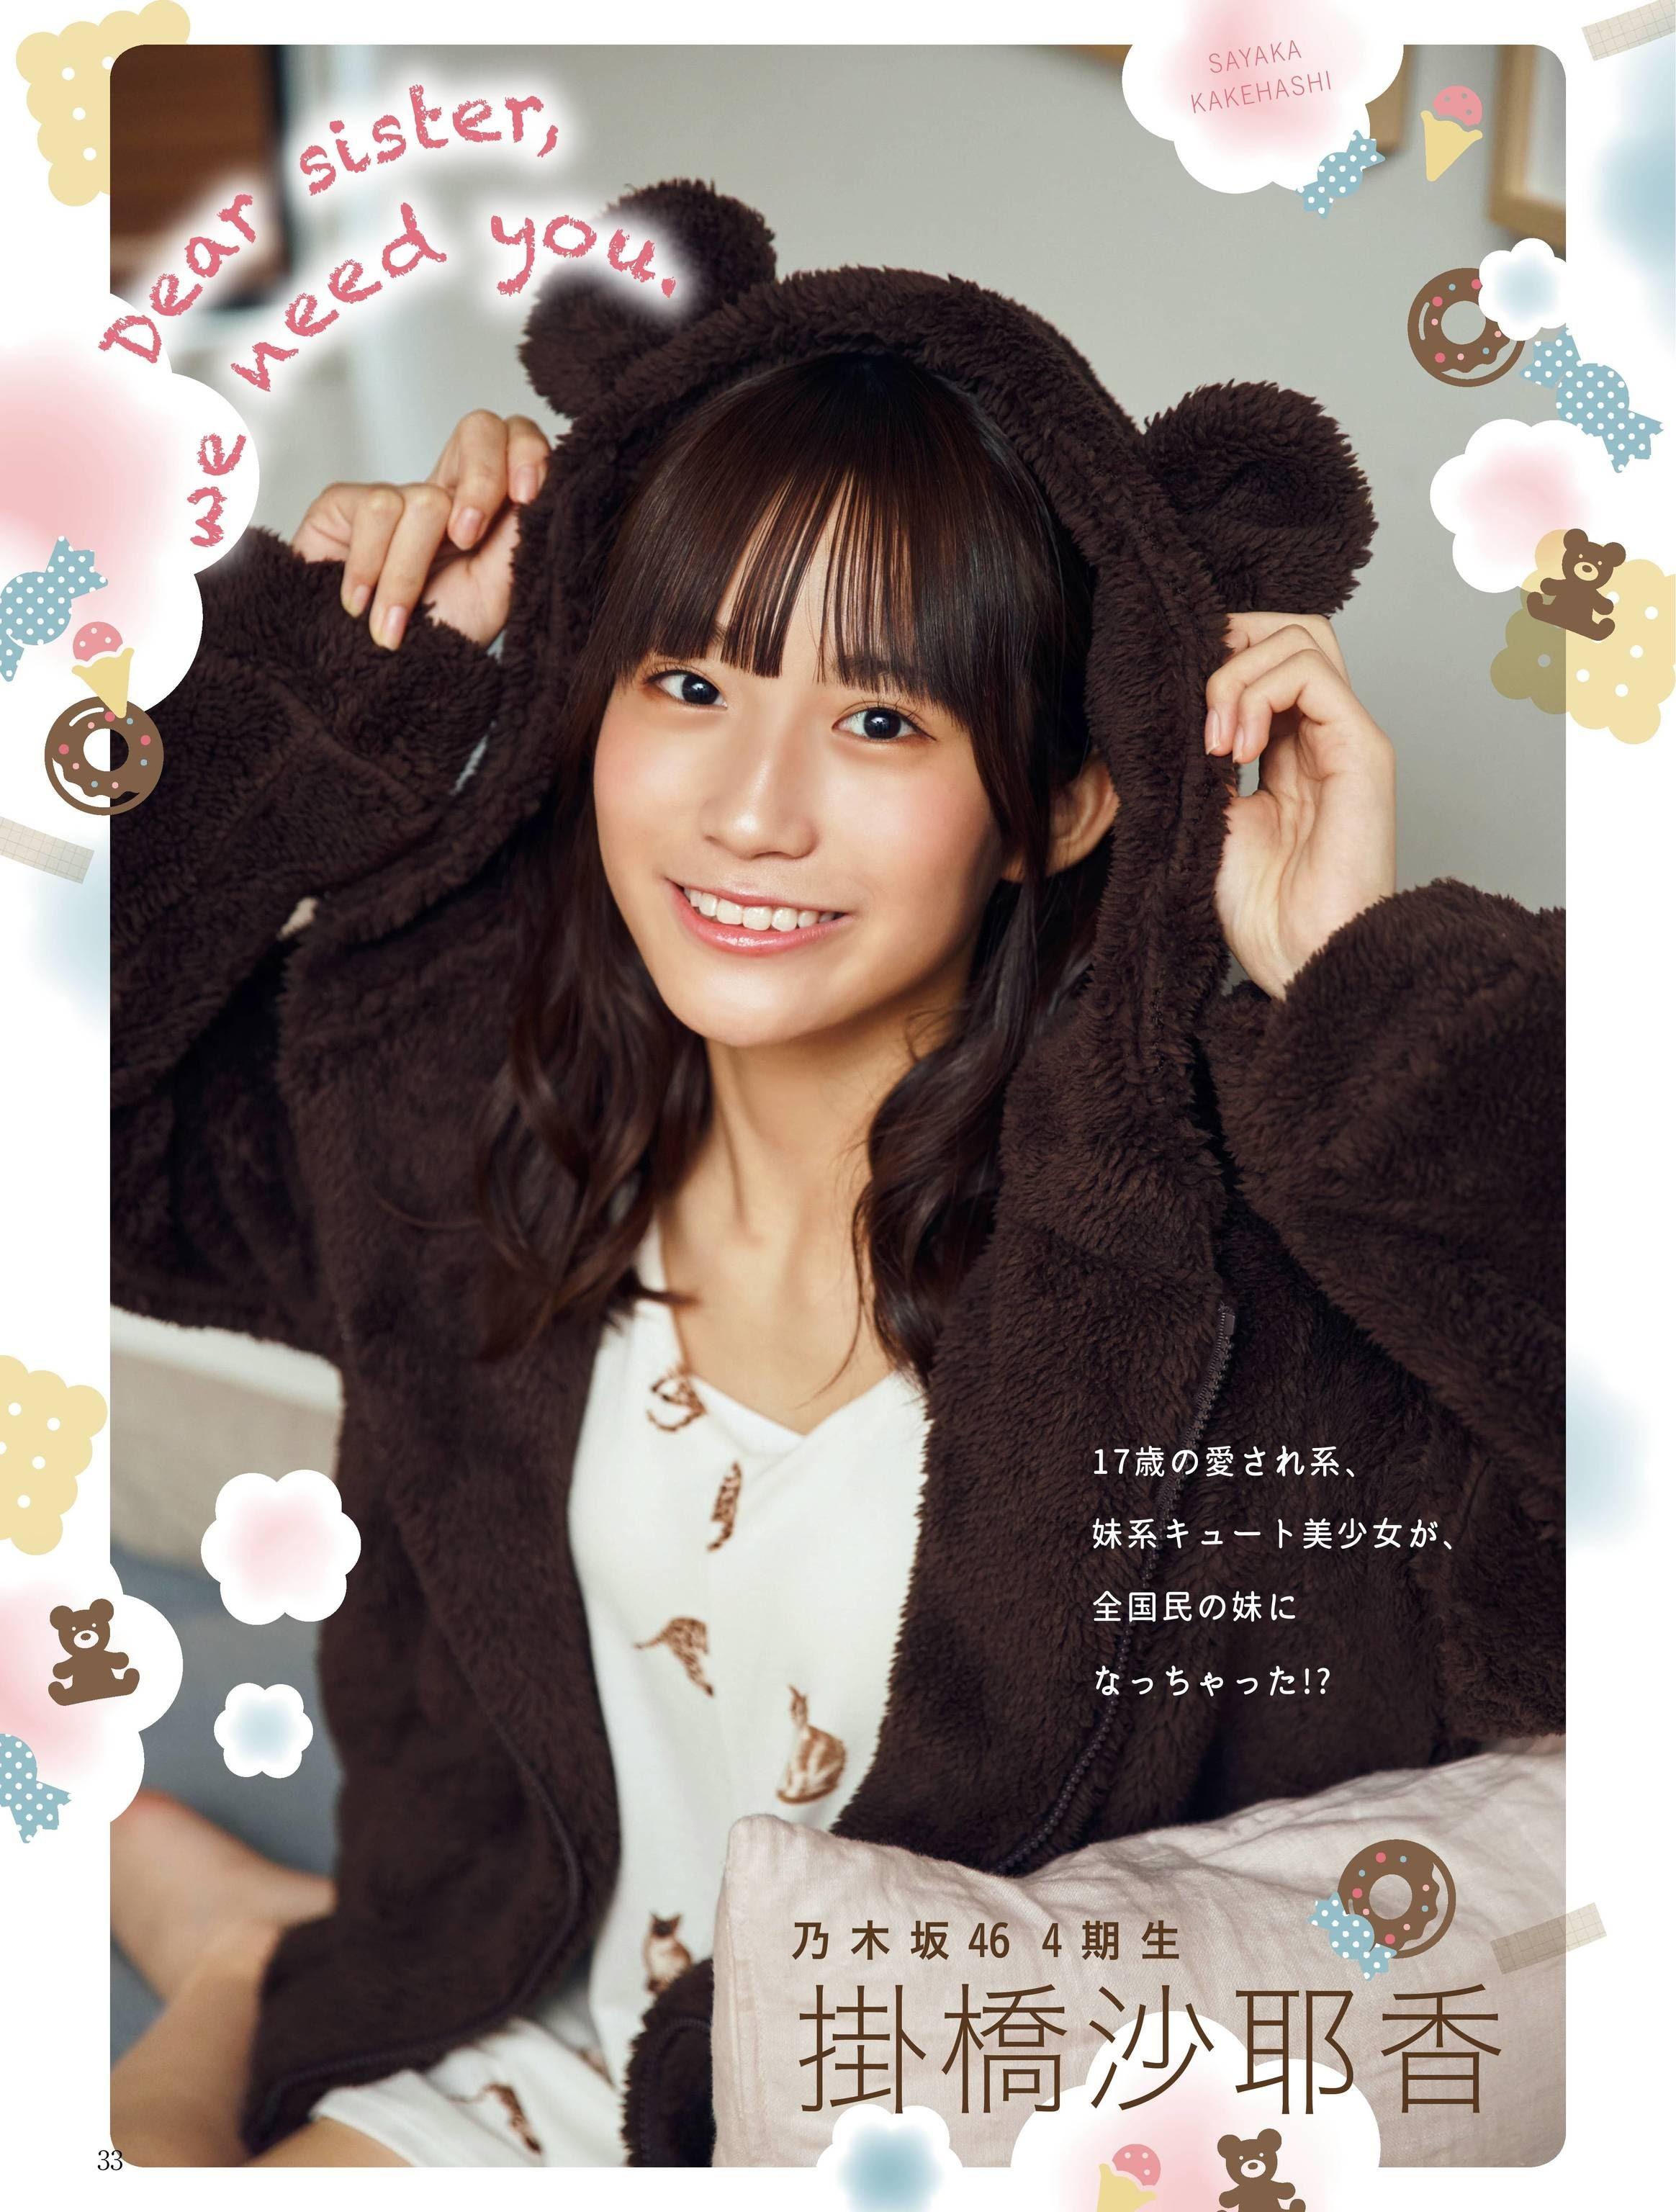 03-Sayaka Kakehashi (1)